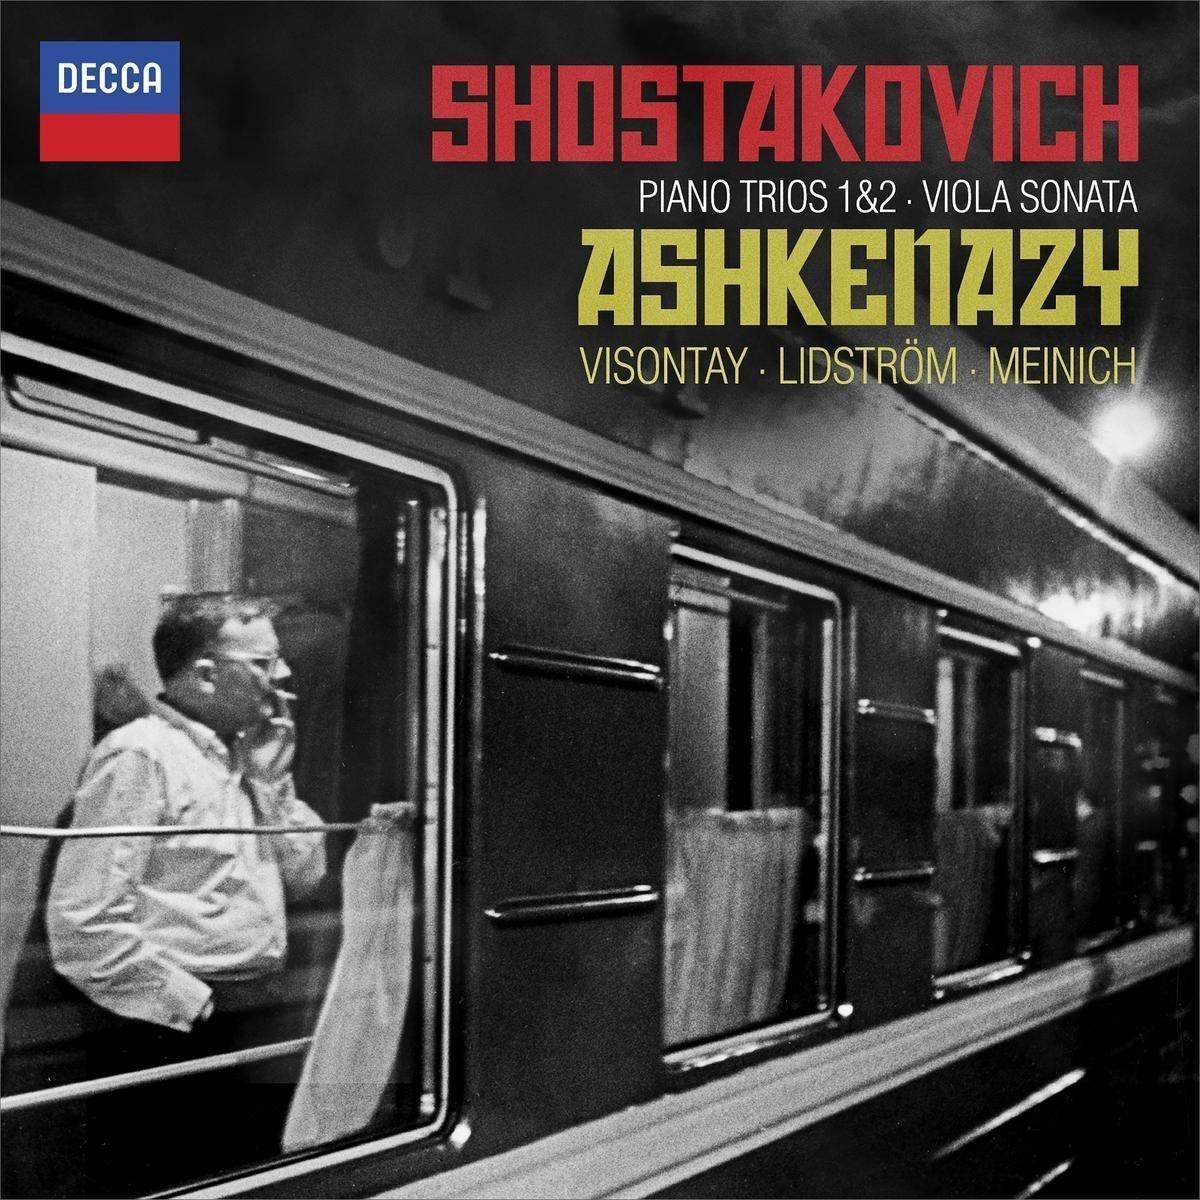 Shostakovich_Piano-Trios_Viola-Sonata_DECCA.jpg